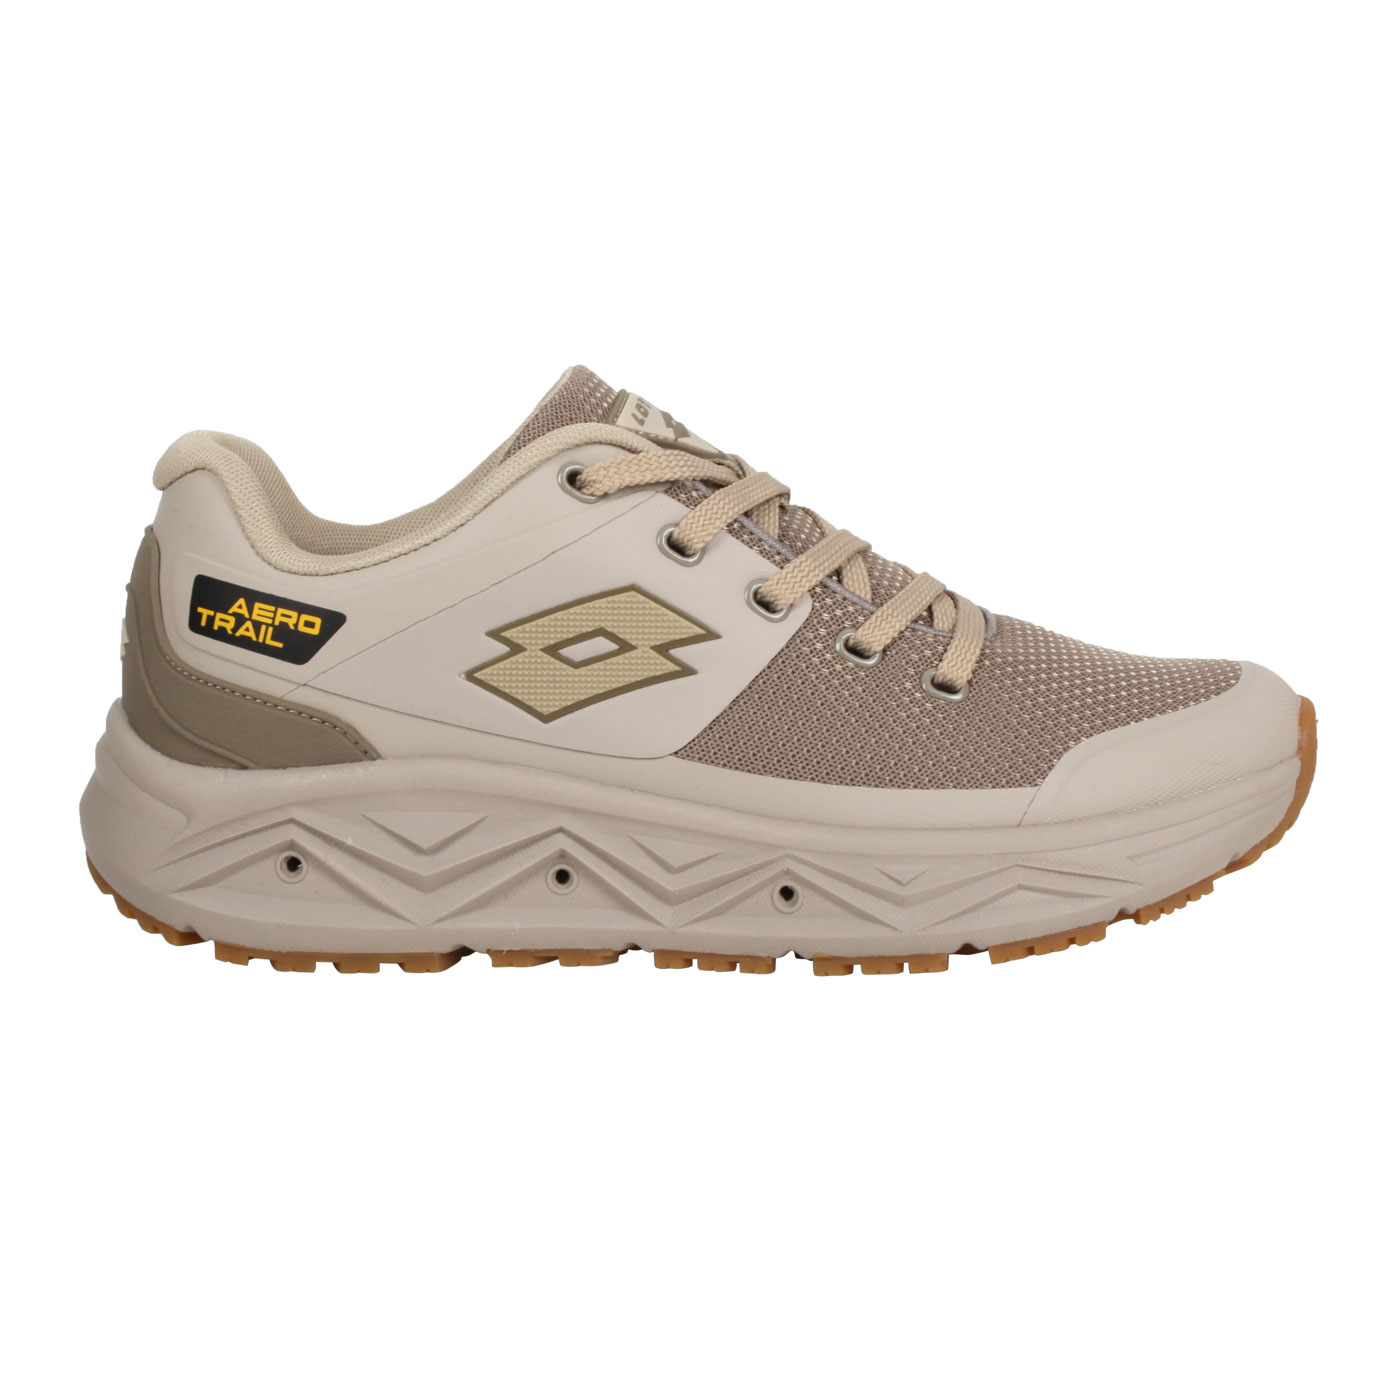 LOTTO 男款透氣越野跑鞋 LT1AMR3601 - 棕黃